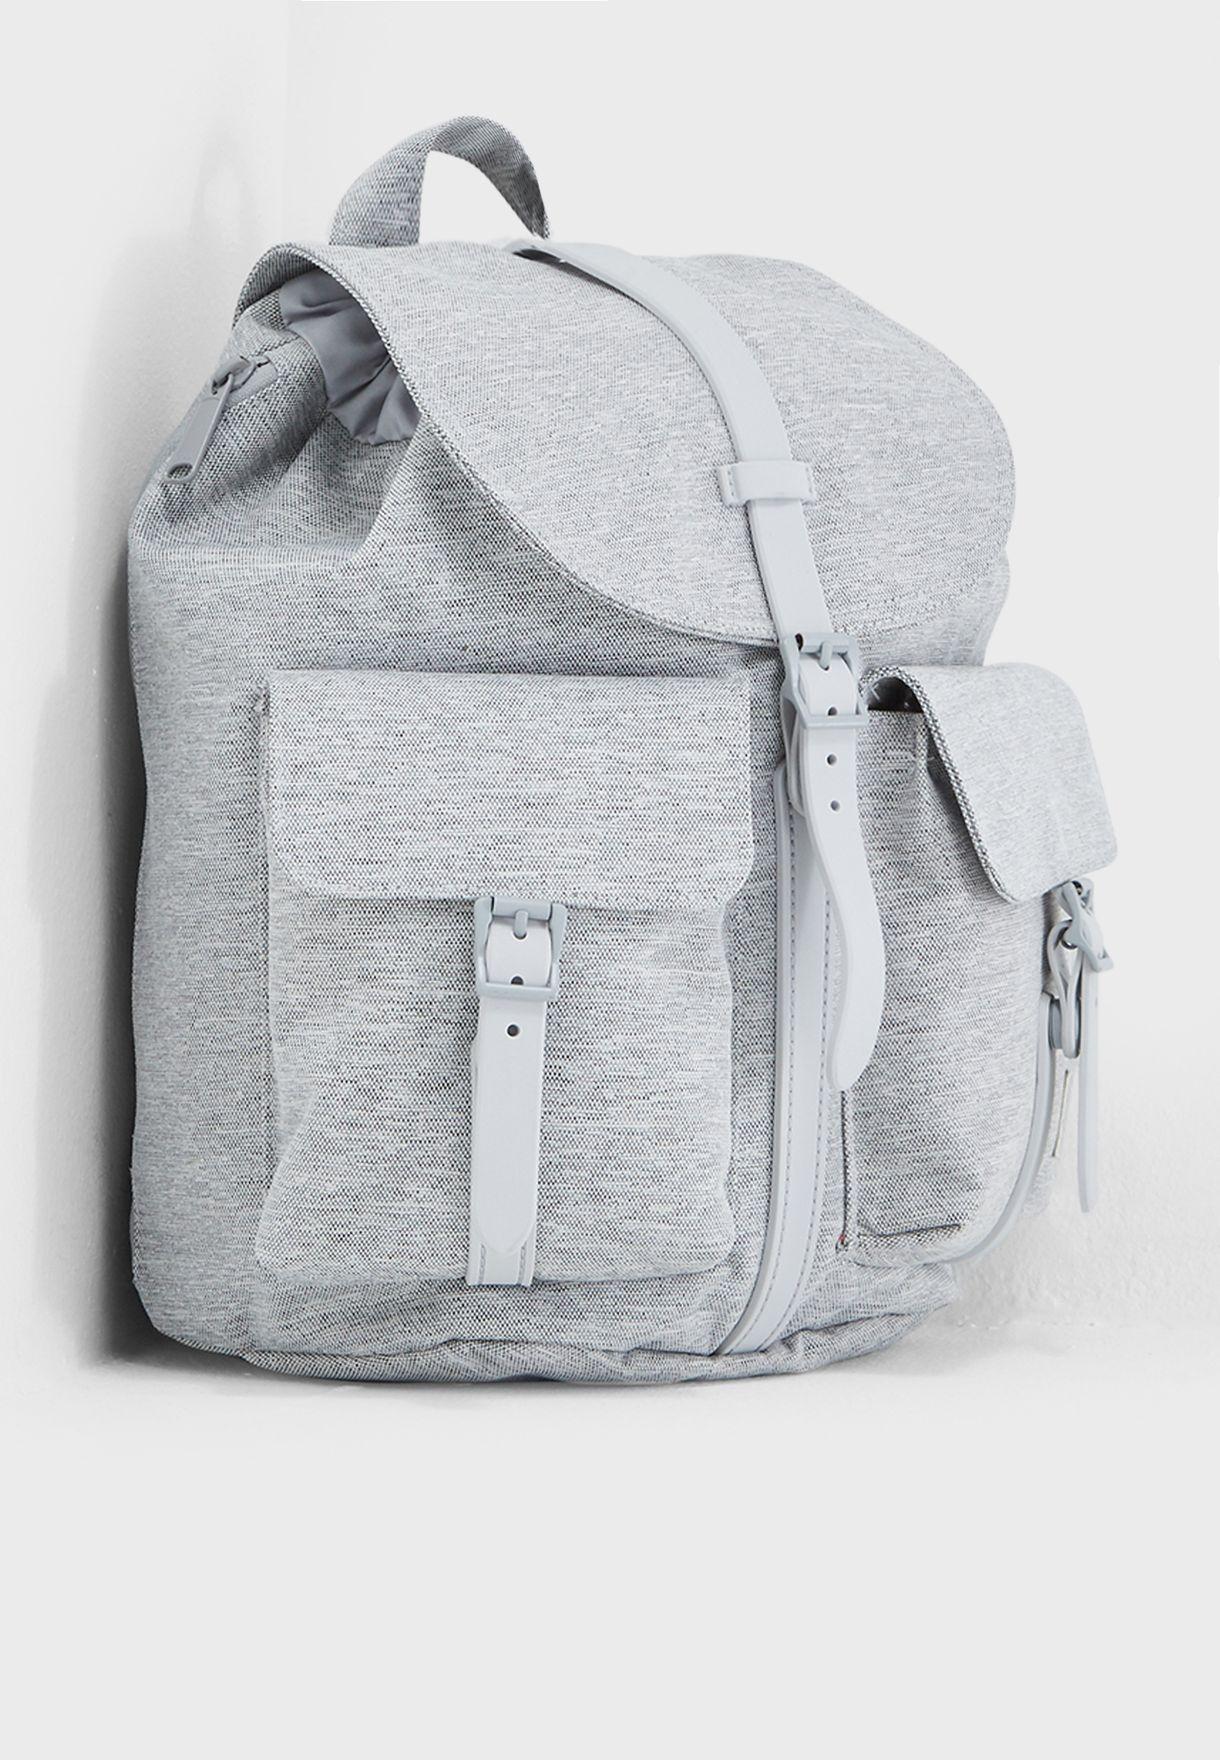 63e5b85866 Shop Herschel grey Extra Small Dawson Backpack 10301-01866-OS for ...